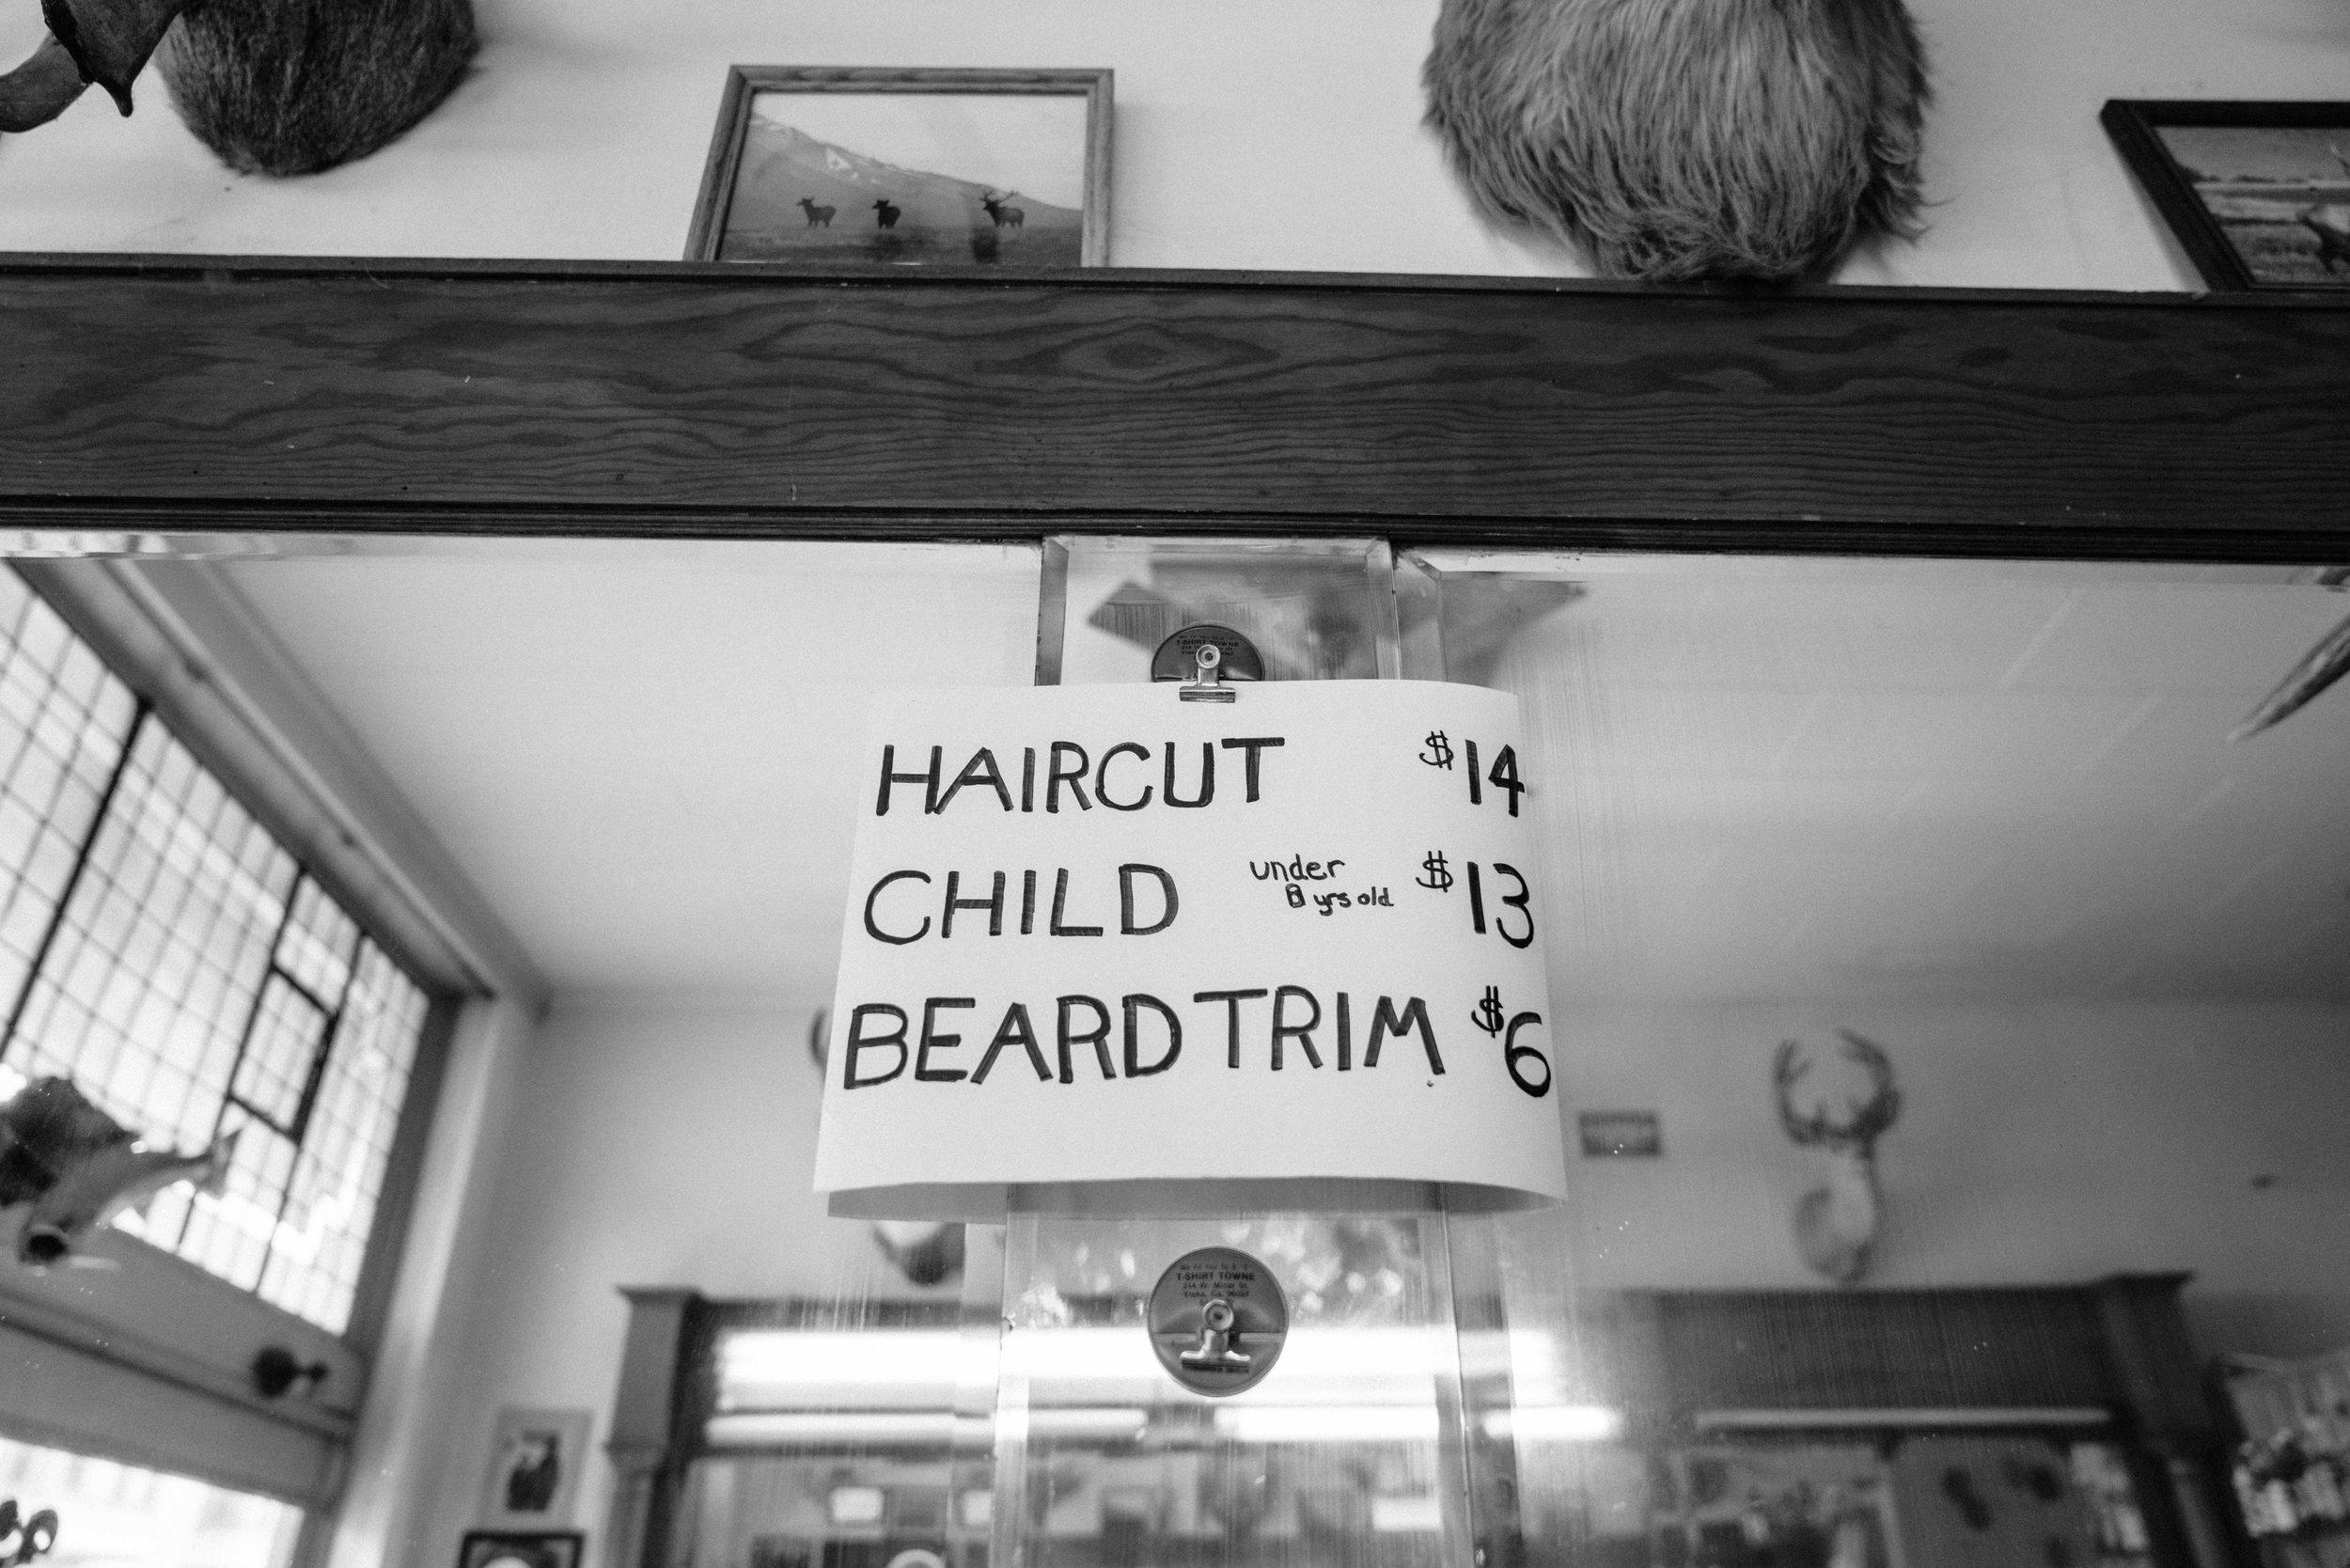 josue-rivas-culture-crush-state-of-jefferson-barber.jpg